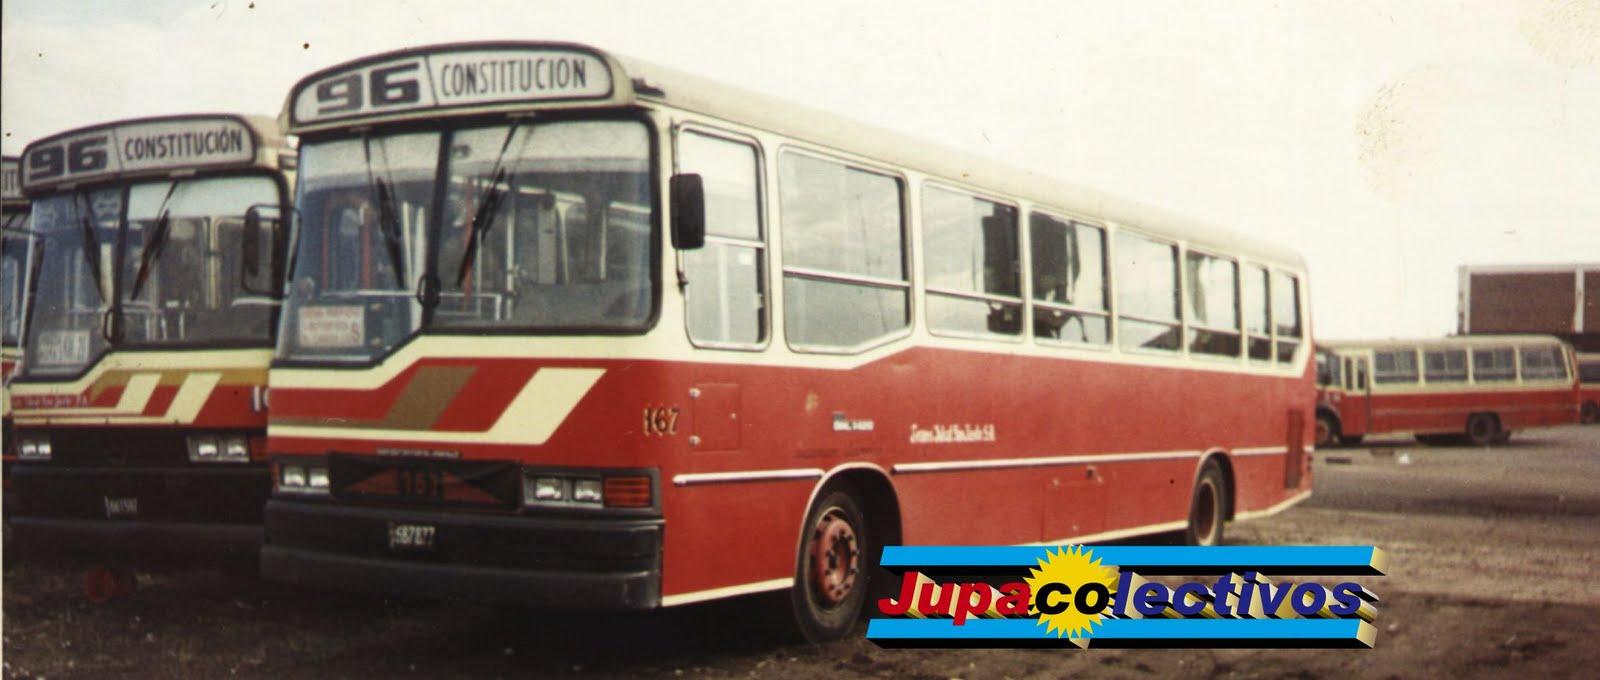 Fotos de colectivos especial transporte ideal san justo for San juan mercedes benz